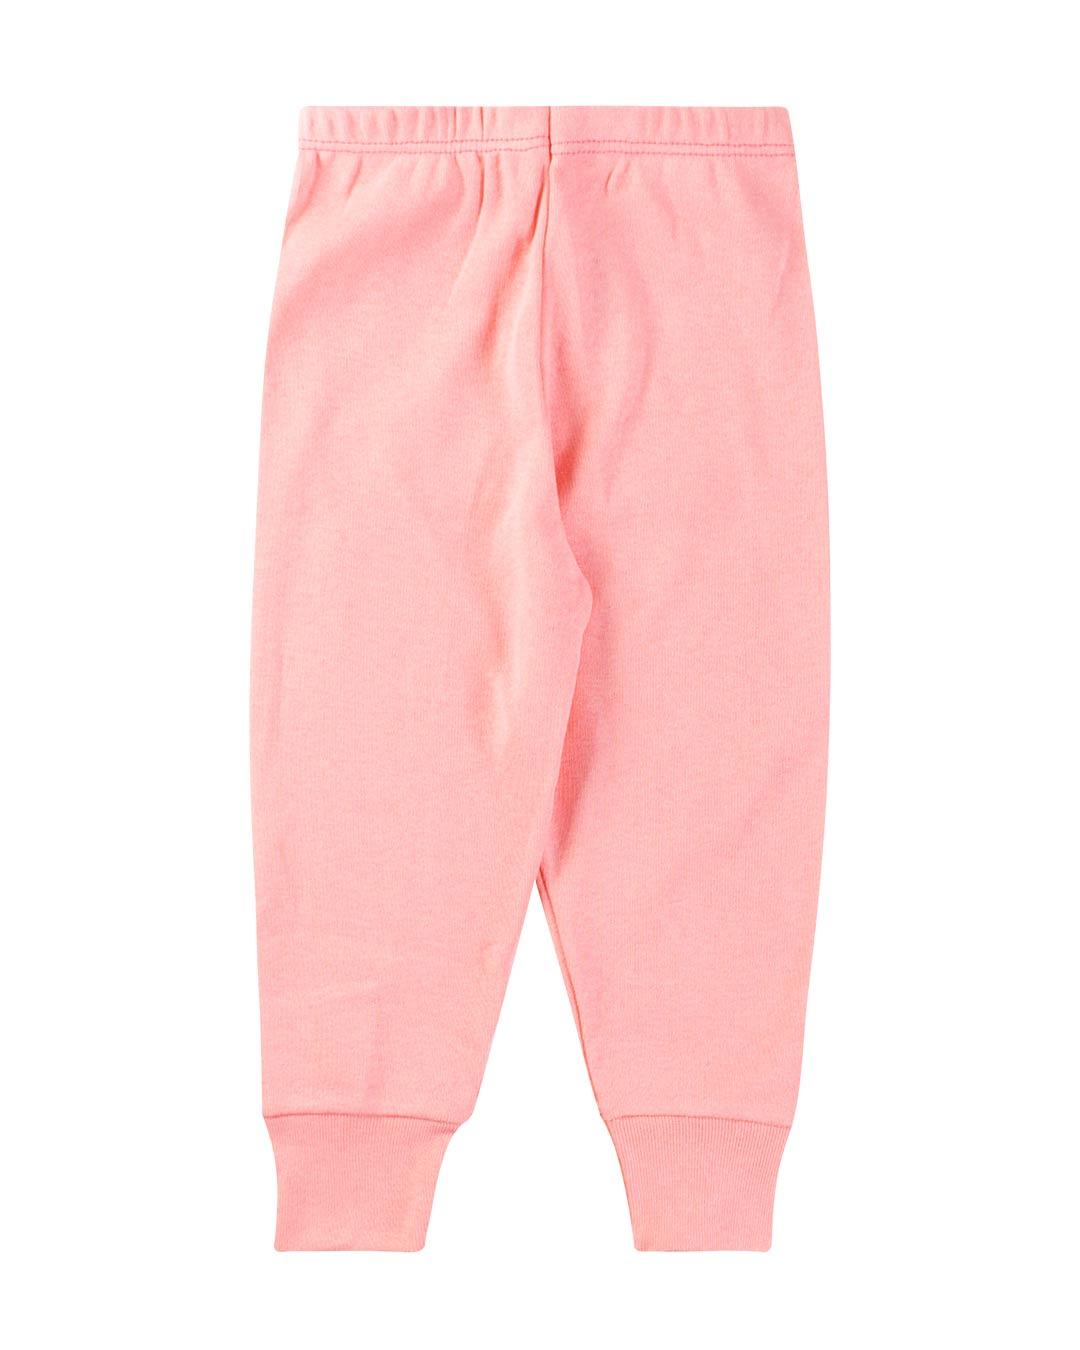 Kit 3 Mijões Básicos Pink - Sorriso Kids